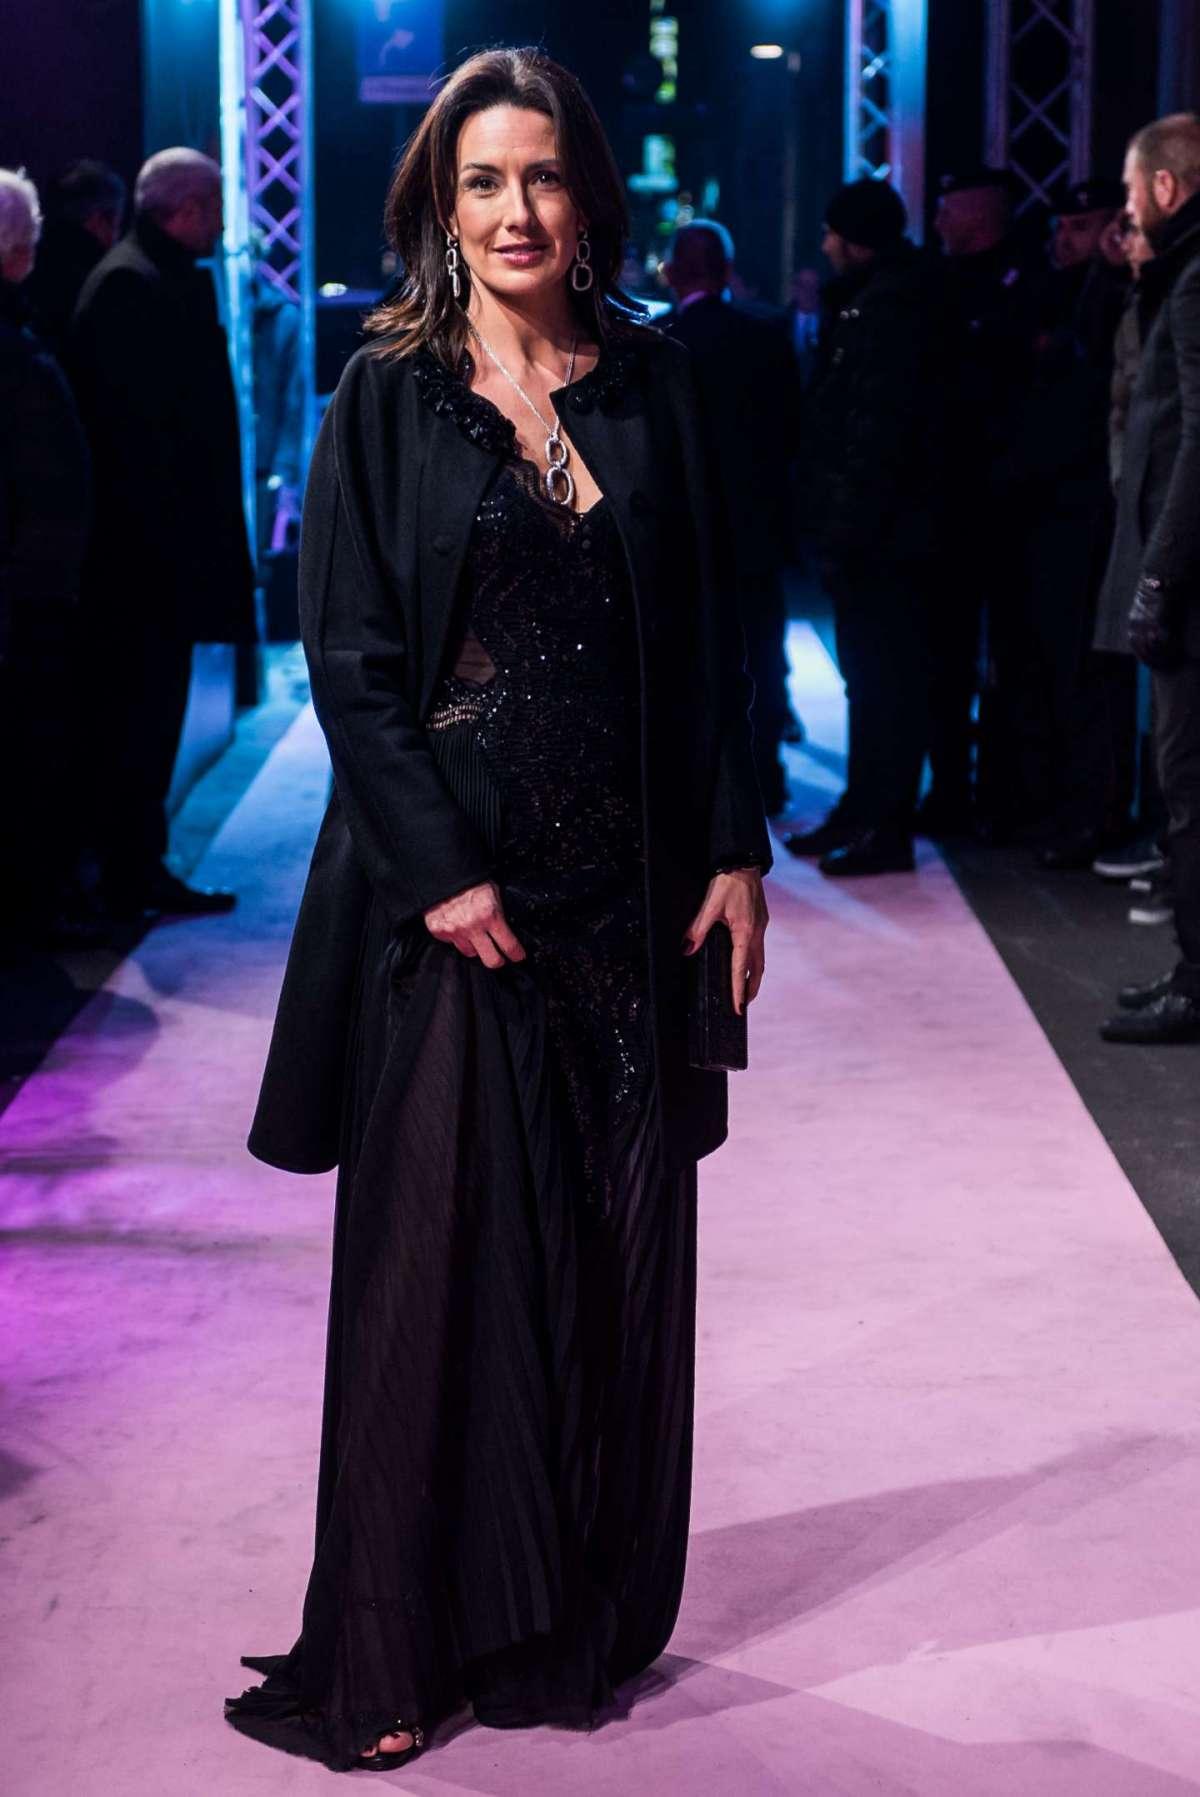 Elisabetta Muscarello in total black a un evento di moda e calcio a Milano